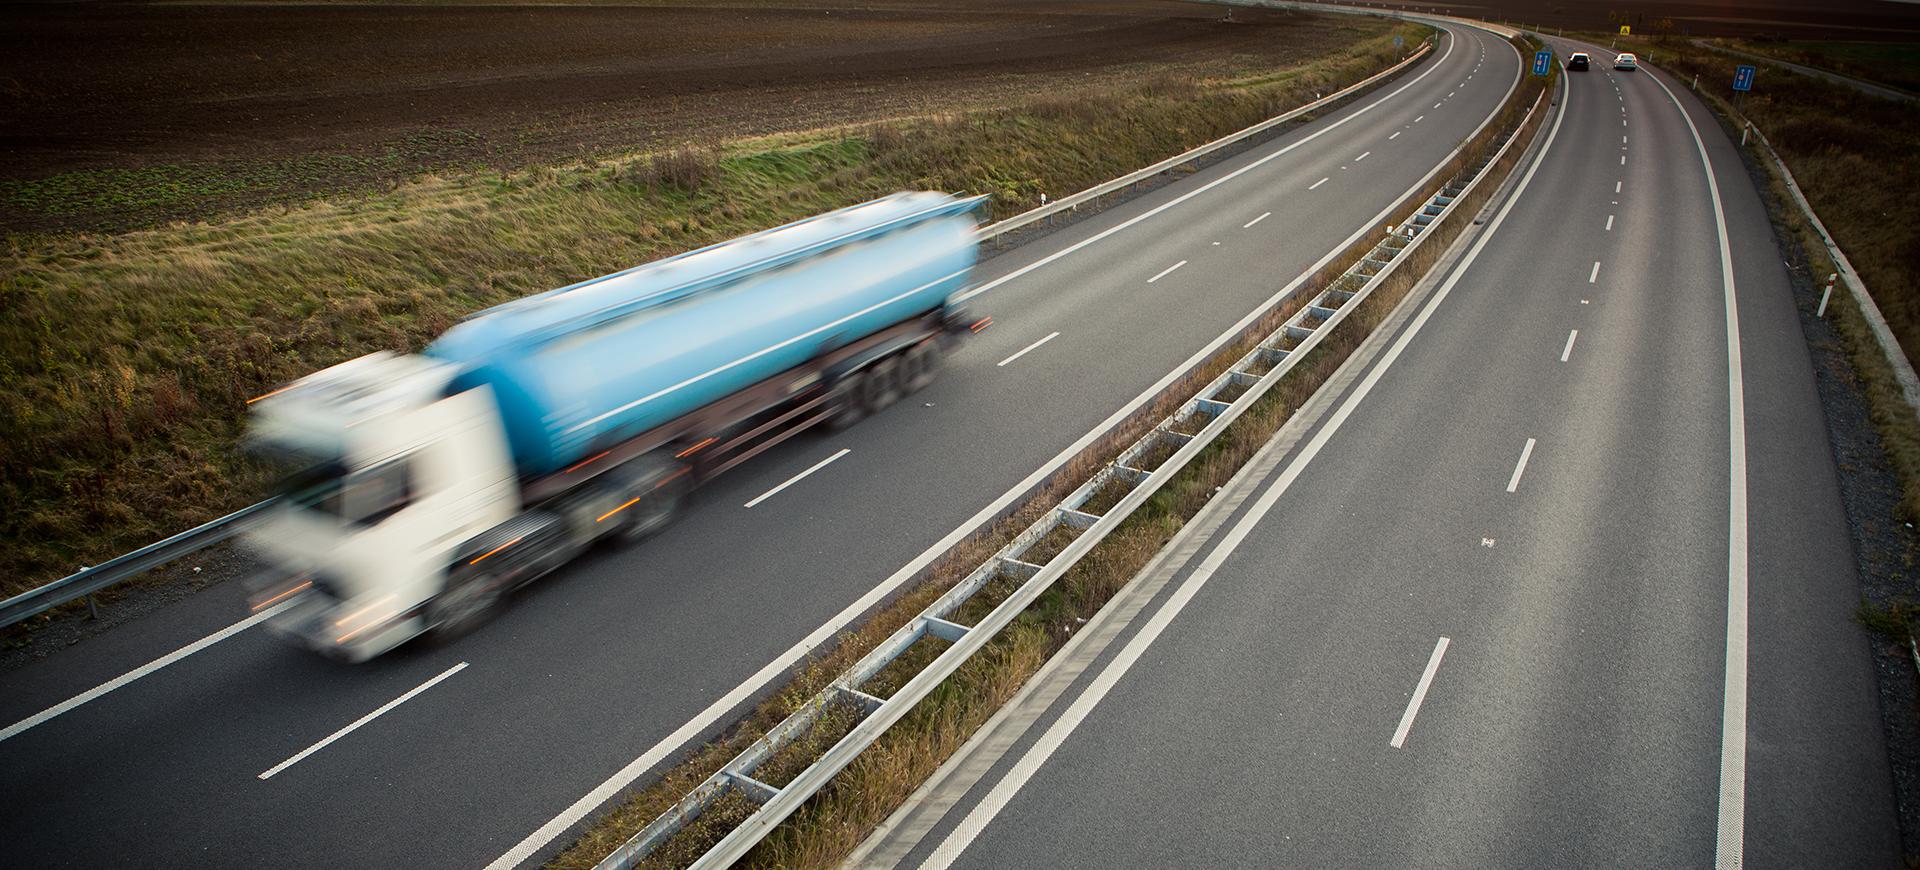 truck estrada transpiraja